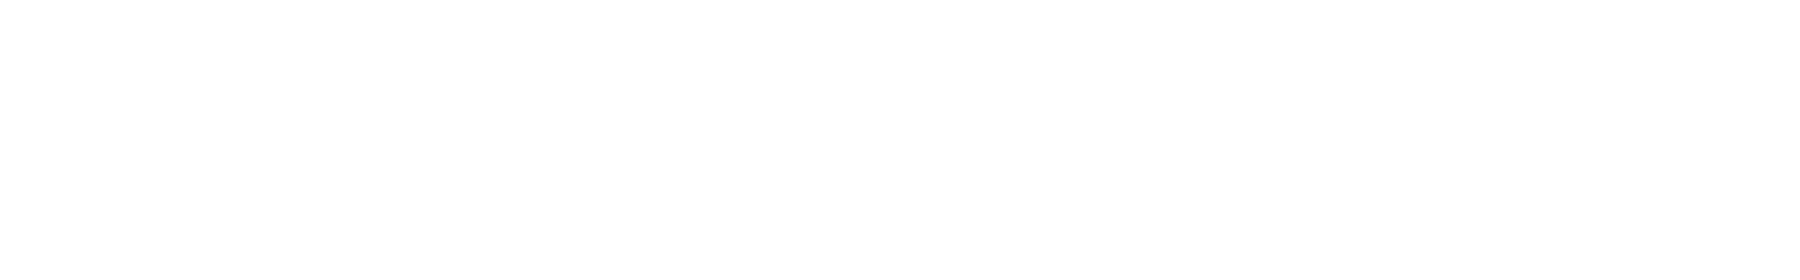 hvlcyon serum snare 02